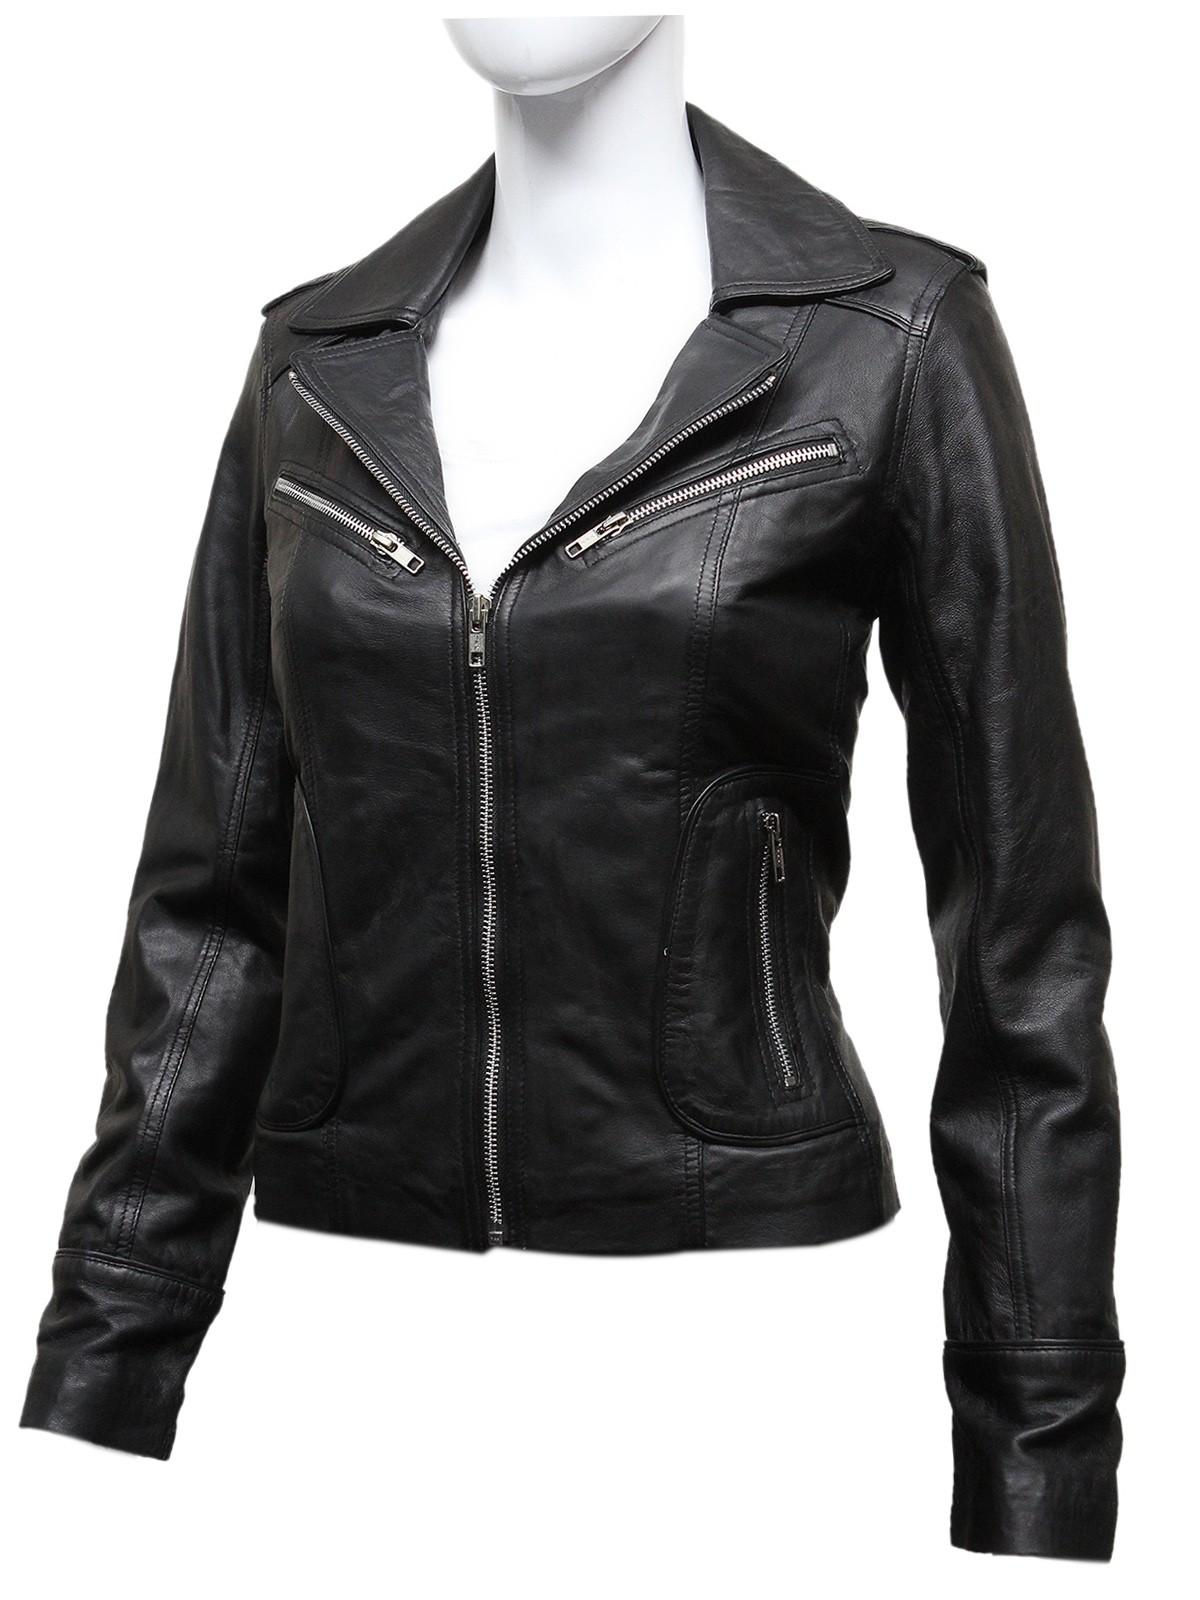 Women's Leather Biker Jackets Online | BRANDSLOCK.COM - Brandslock